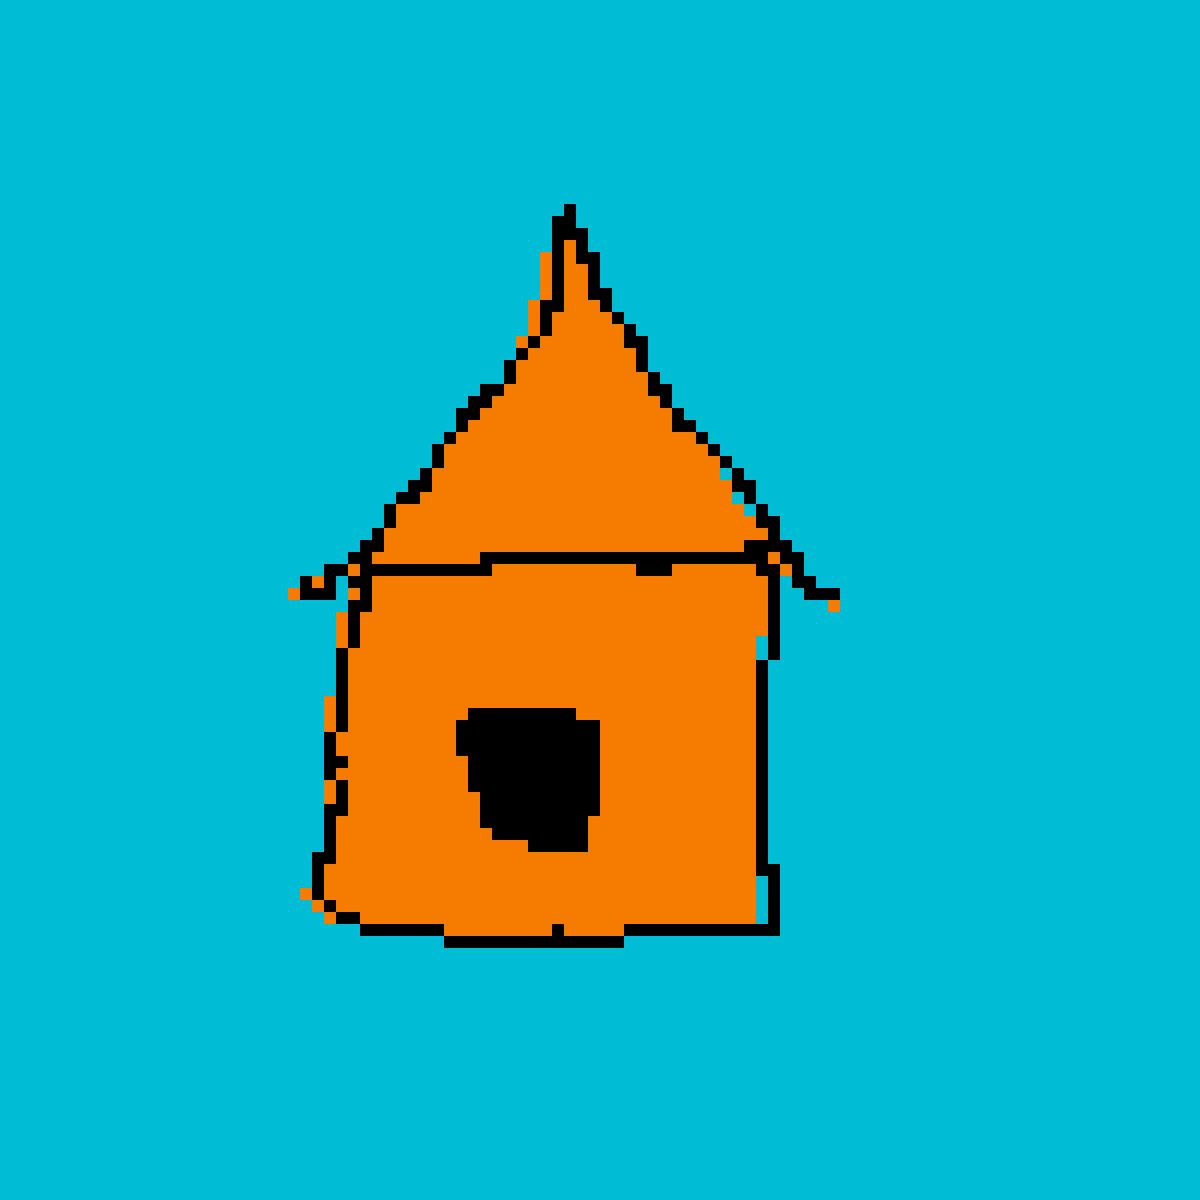 Birdhouse by taylorfamily330